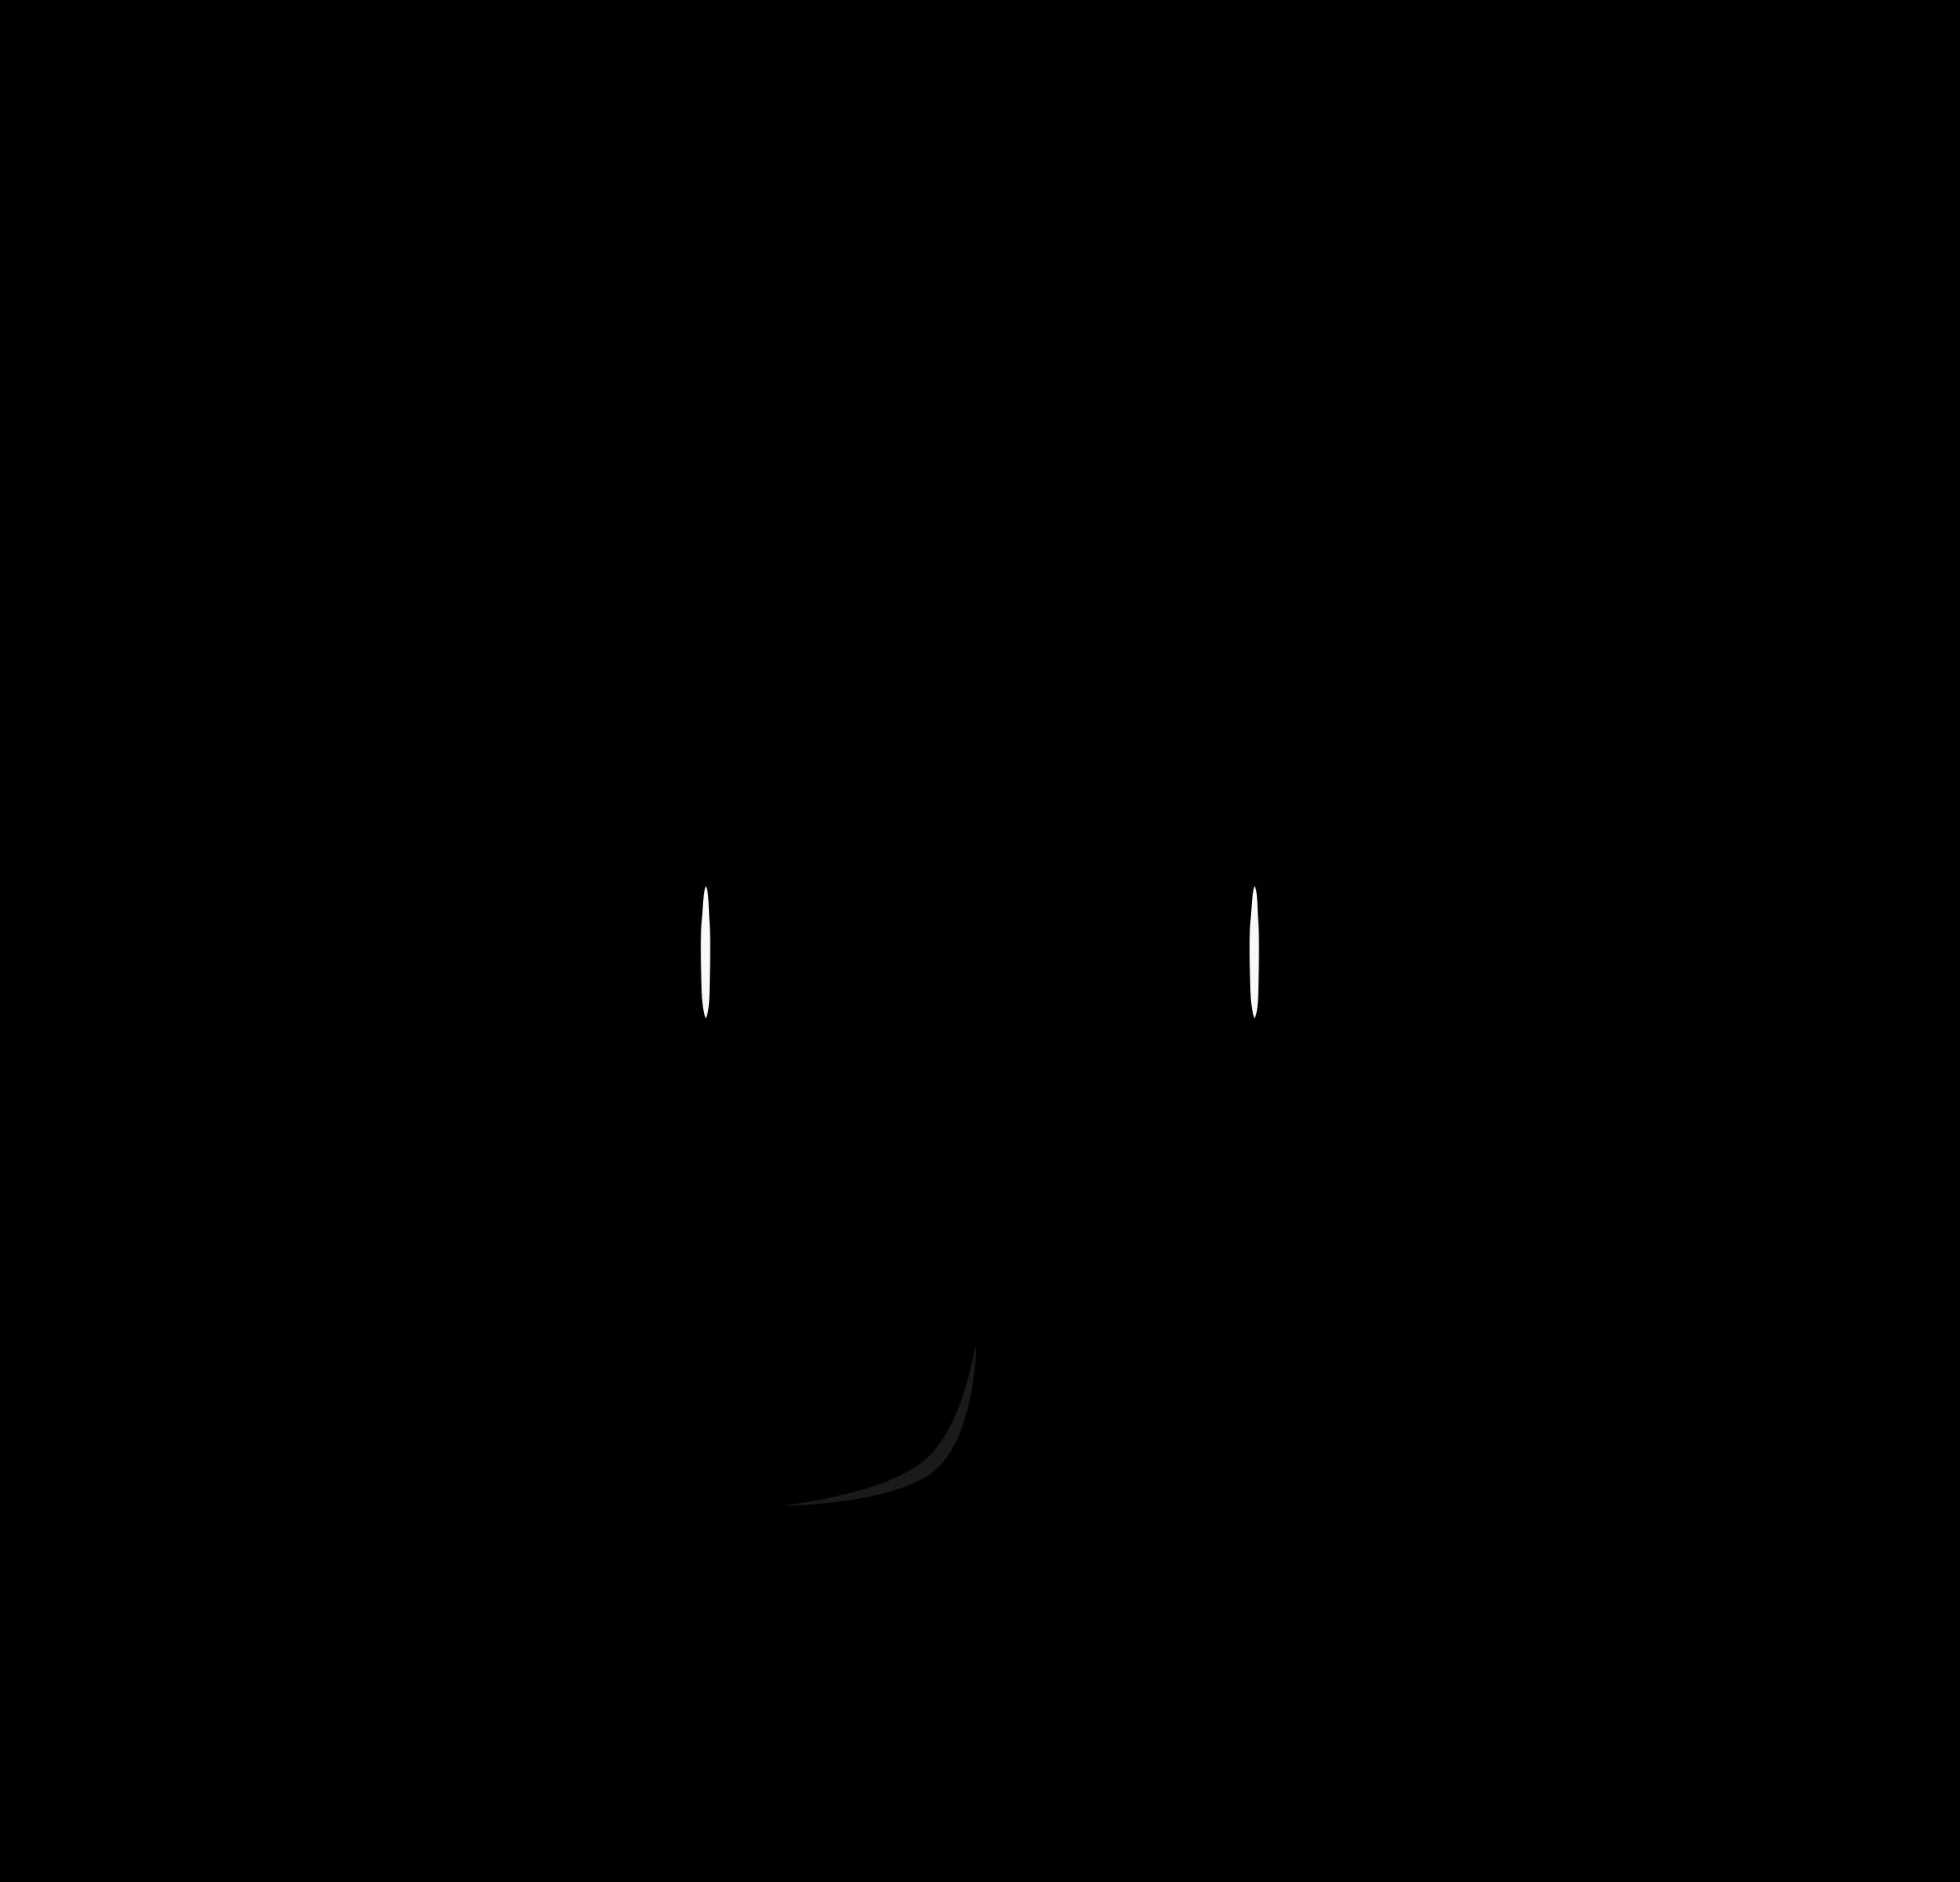 2400x2304 Kitten Face Clipart Black And White